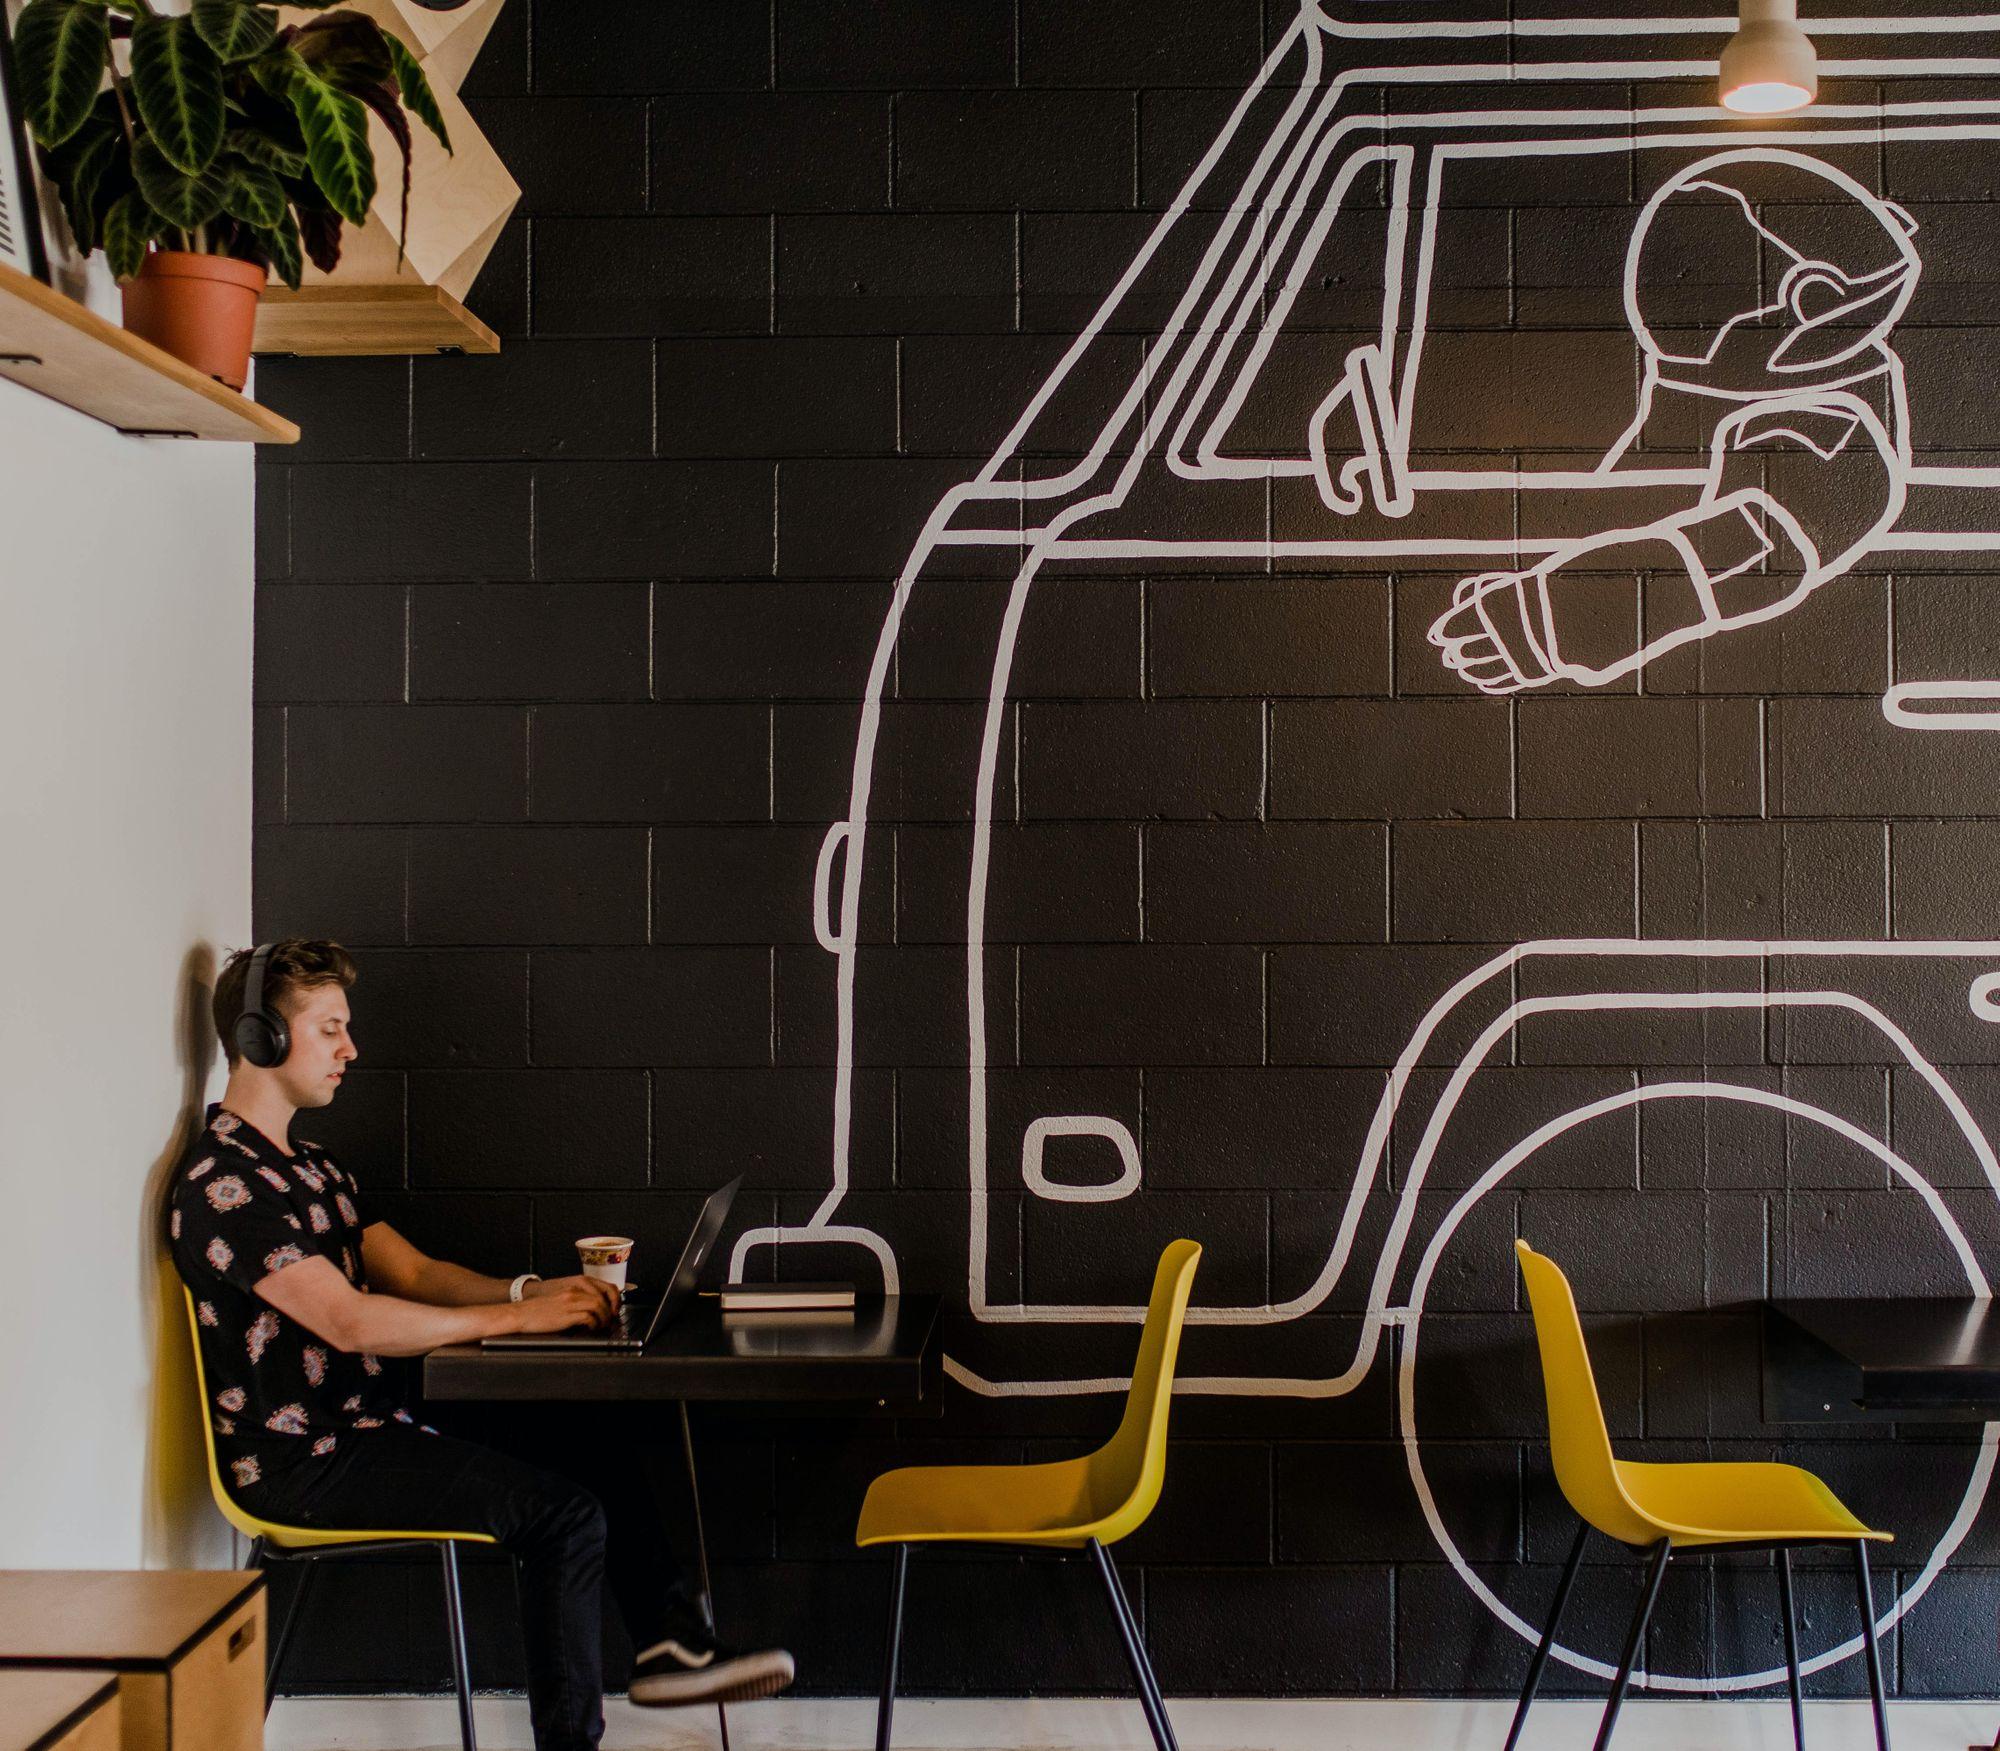 Solo Entrepreneur in cafe